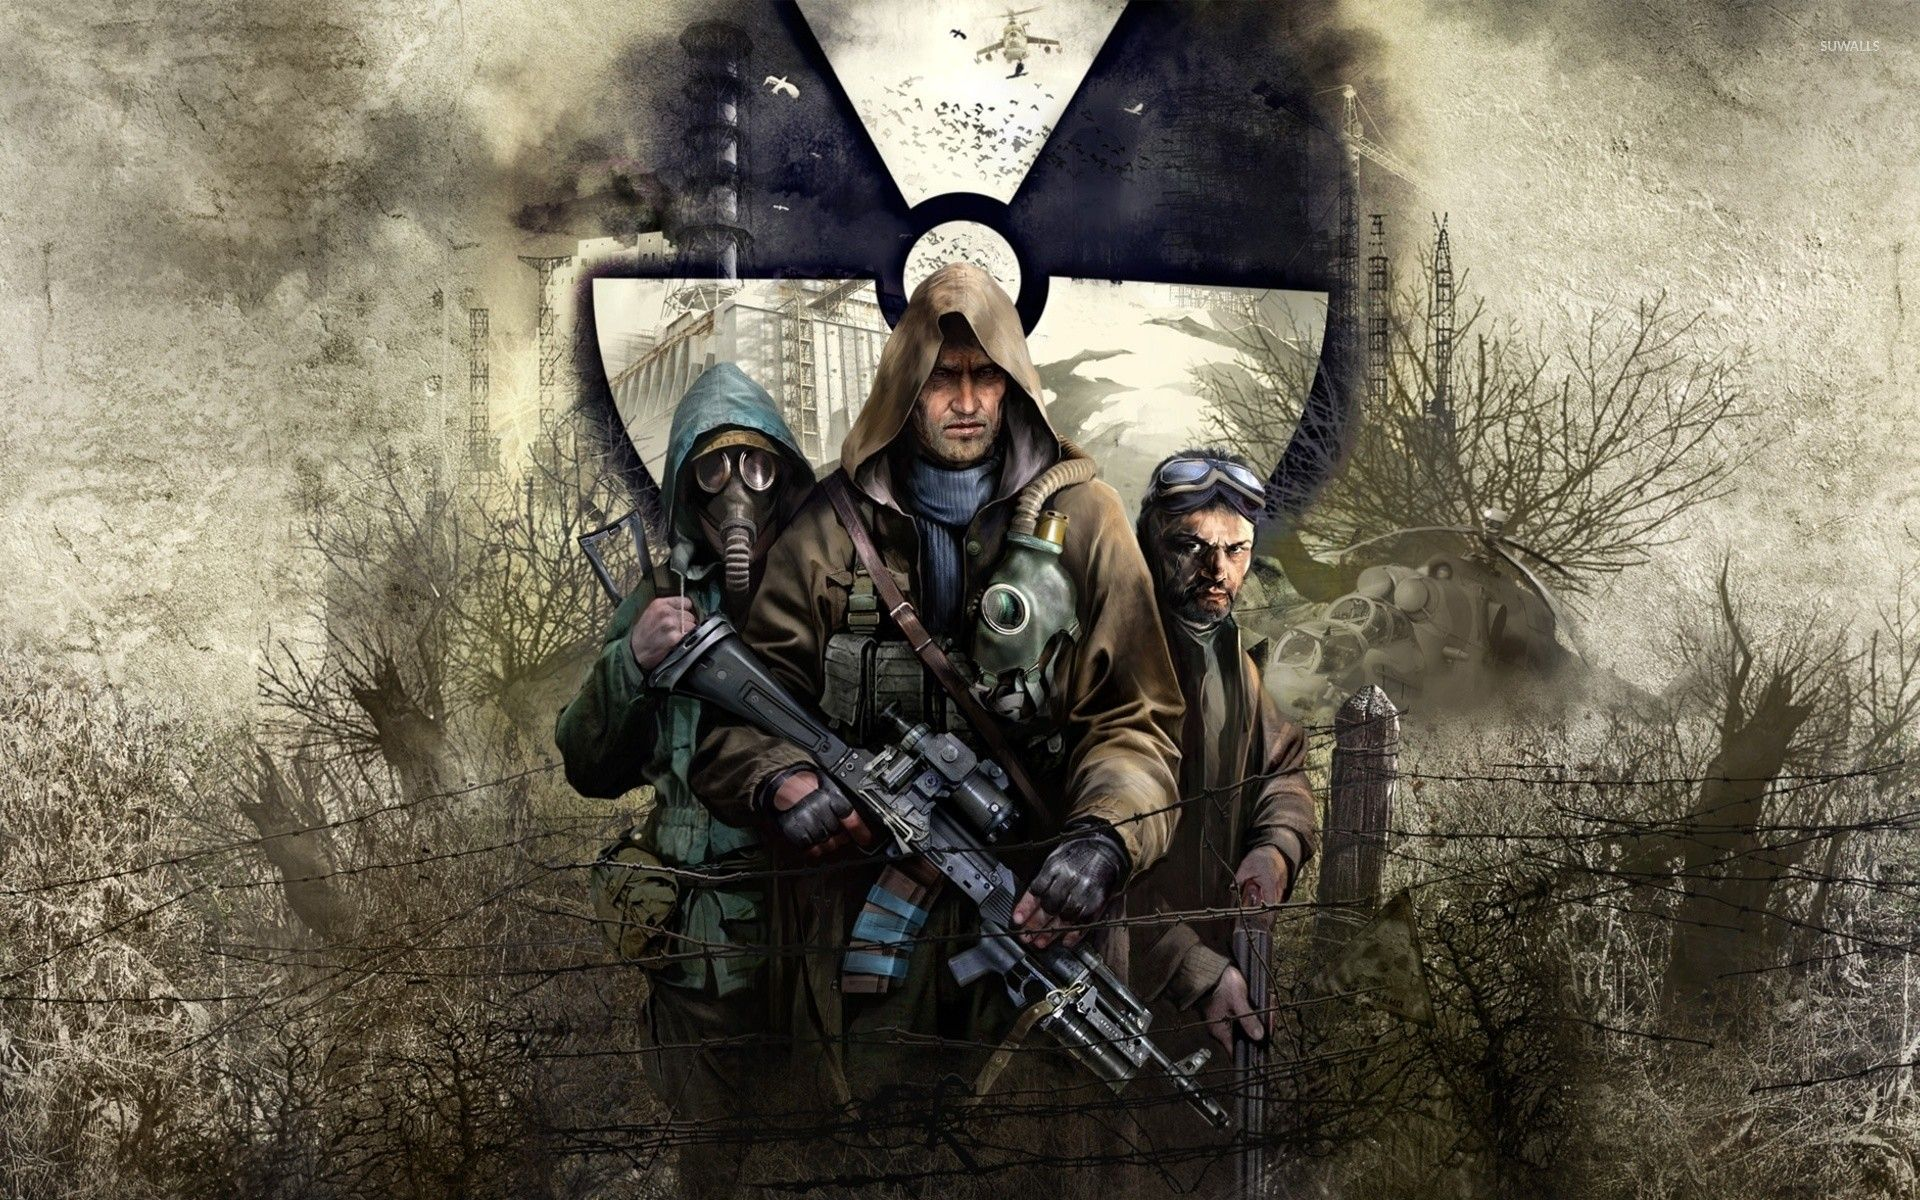 Stalker Shadow Of Chernobyl Pripryat Apocalyptic 43773 Walldevil 1920x1200 Stalker Gaming Wallpapers Best Pc Games